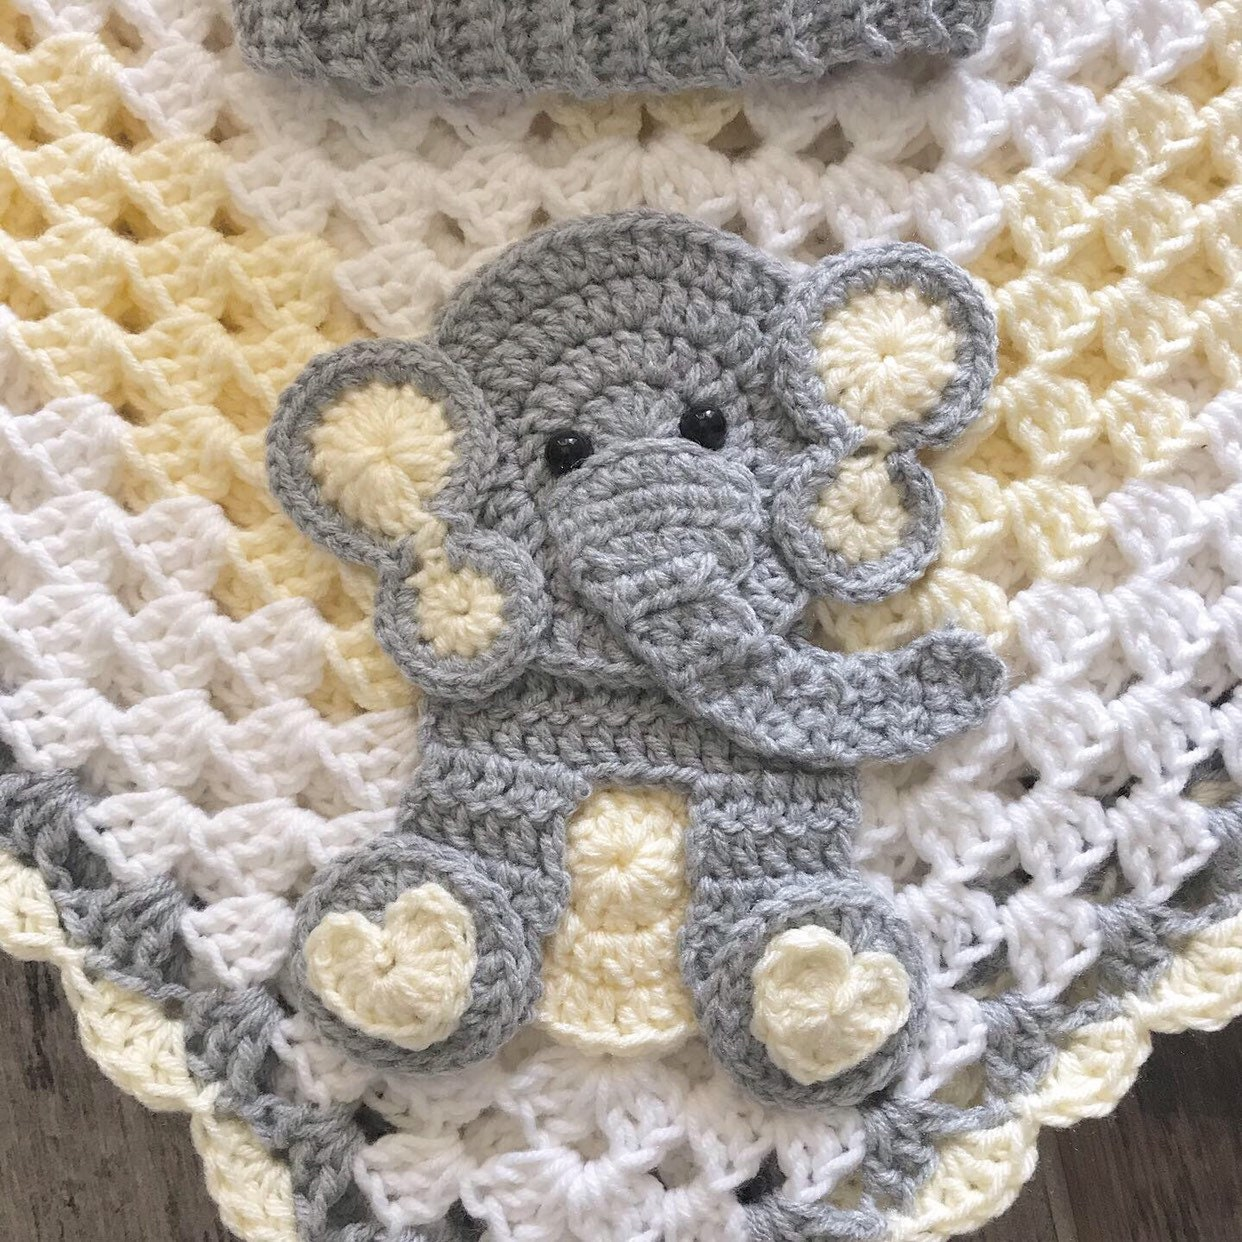 Crochet Baby Blanket Baby Blanket Handmade Baby Blanket Elephant Baby Blanket Crocheted Baby Blanket Baby Elephant